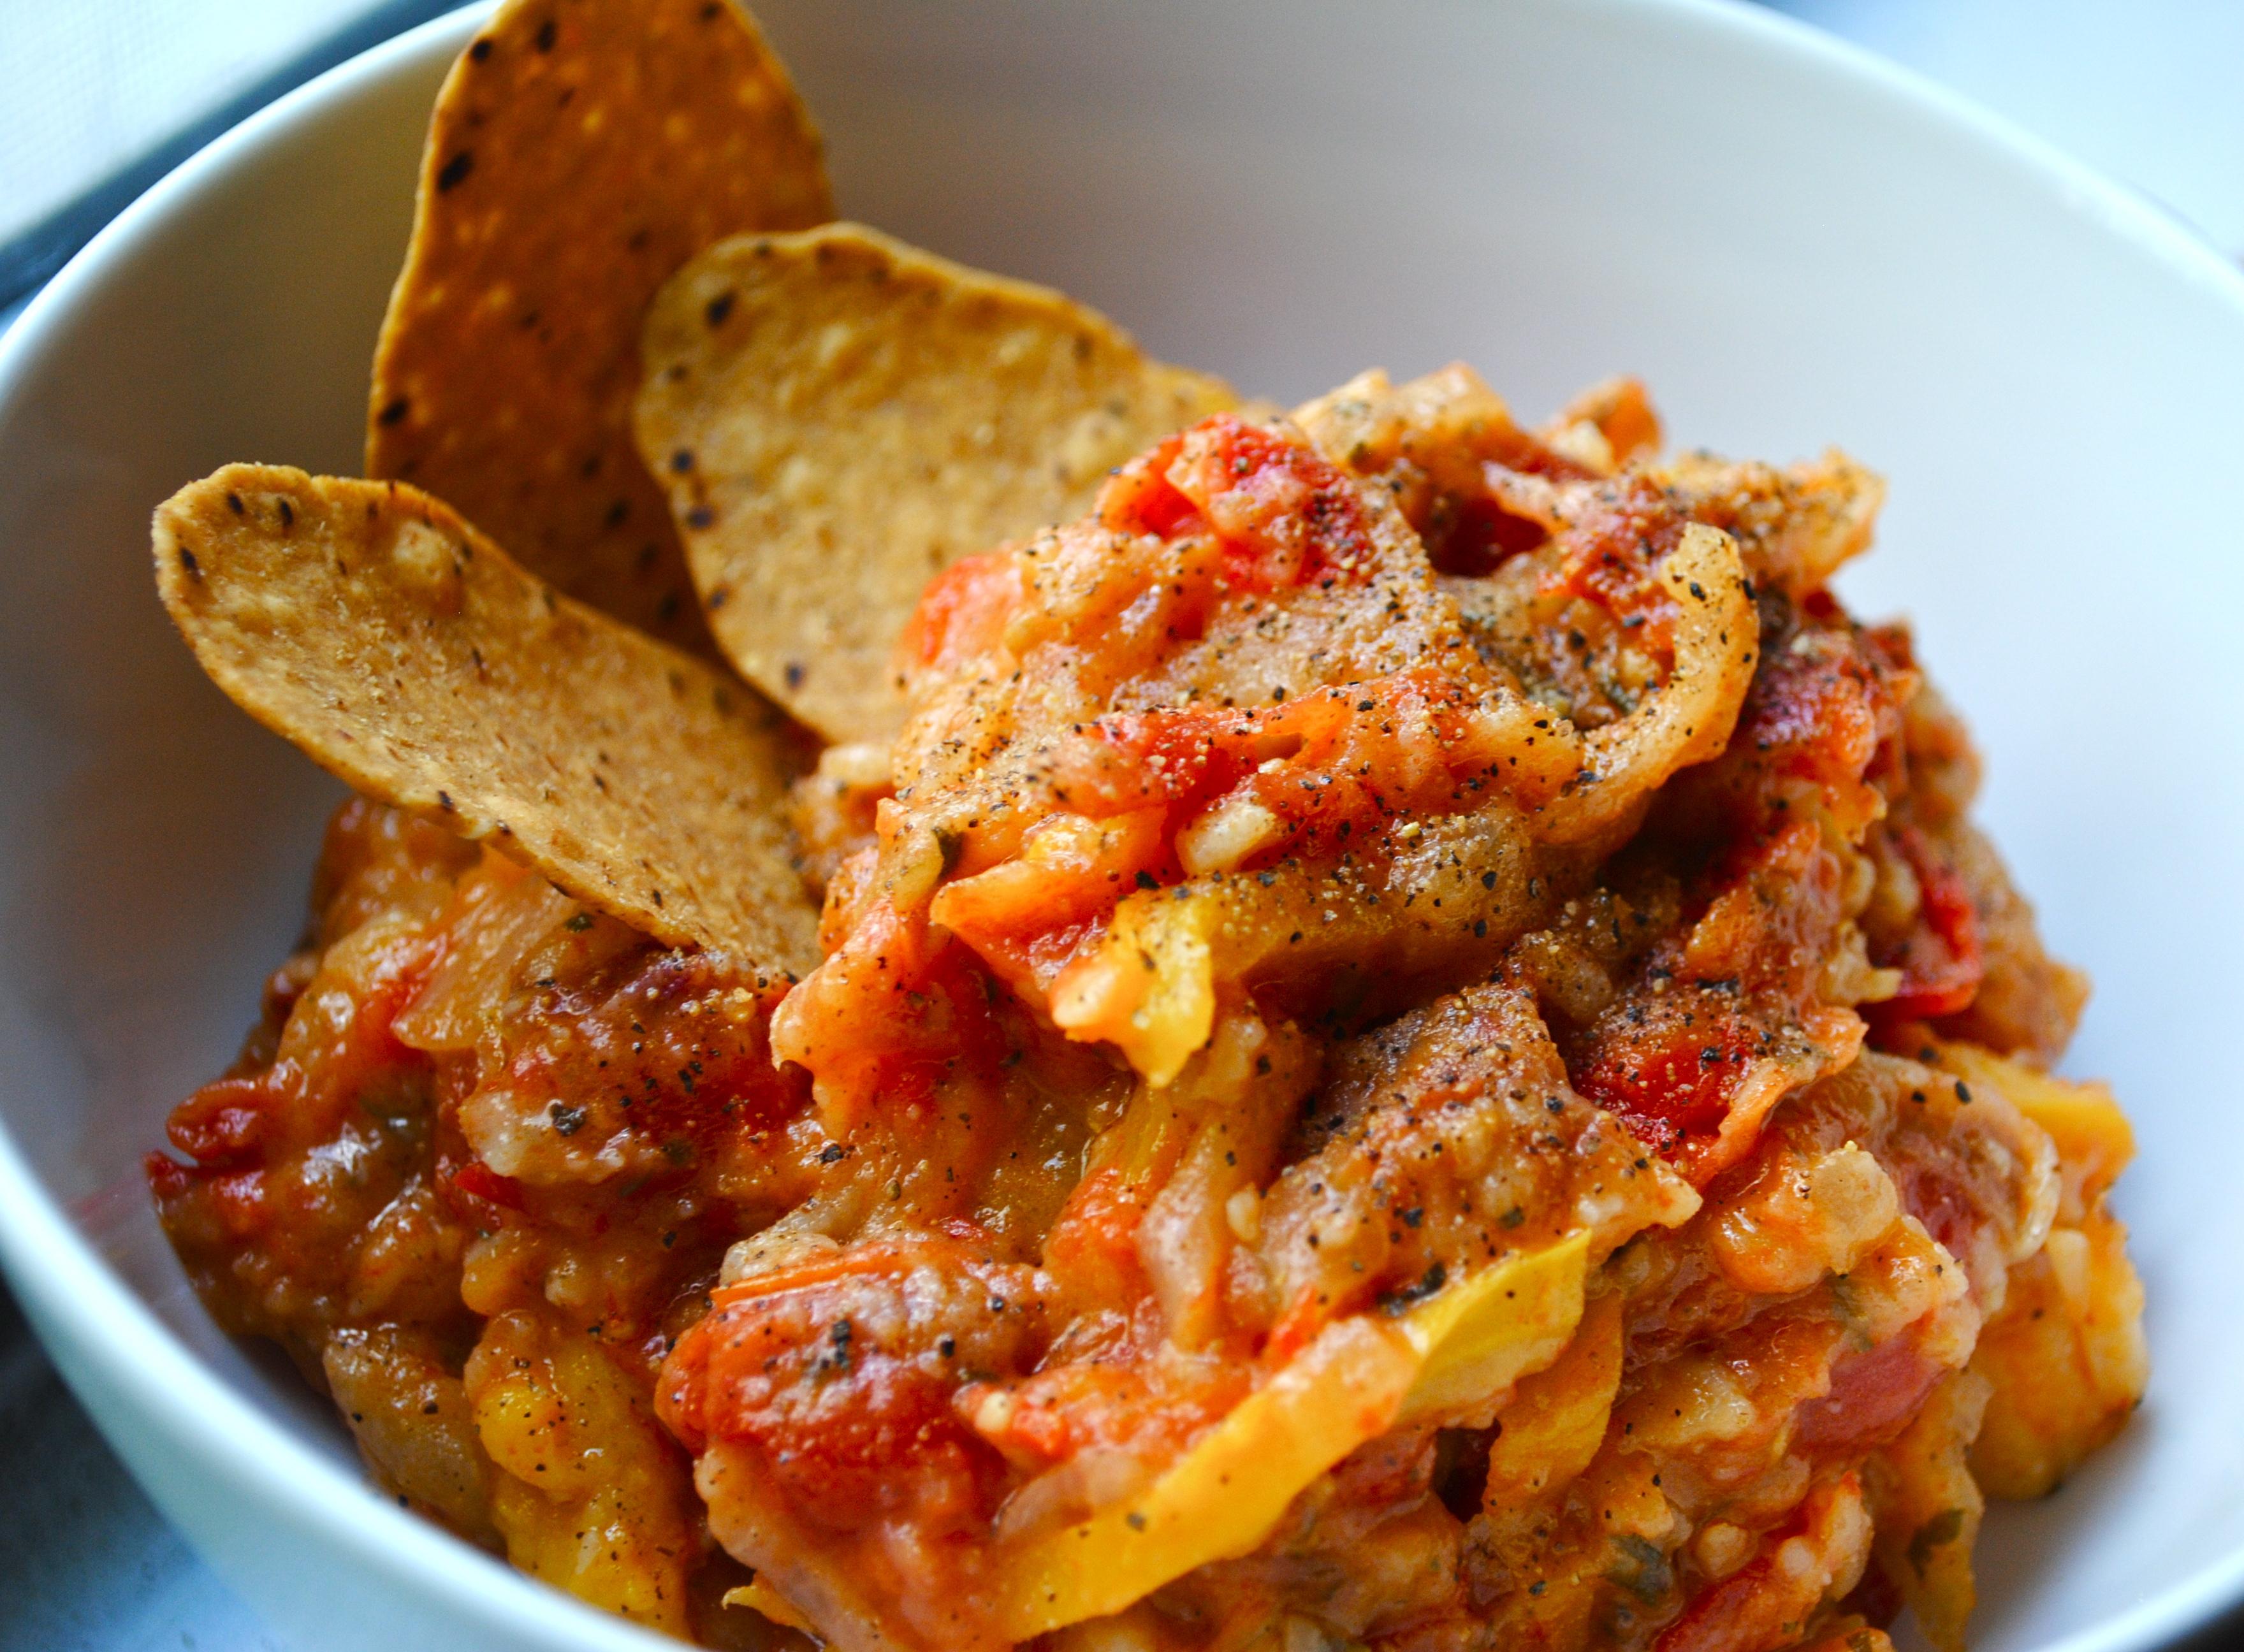 Low fat veggie dip recipe will